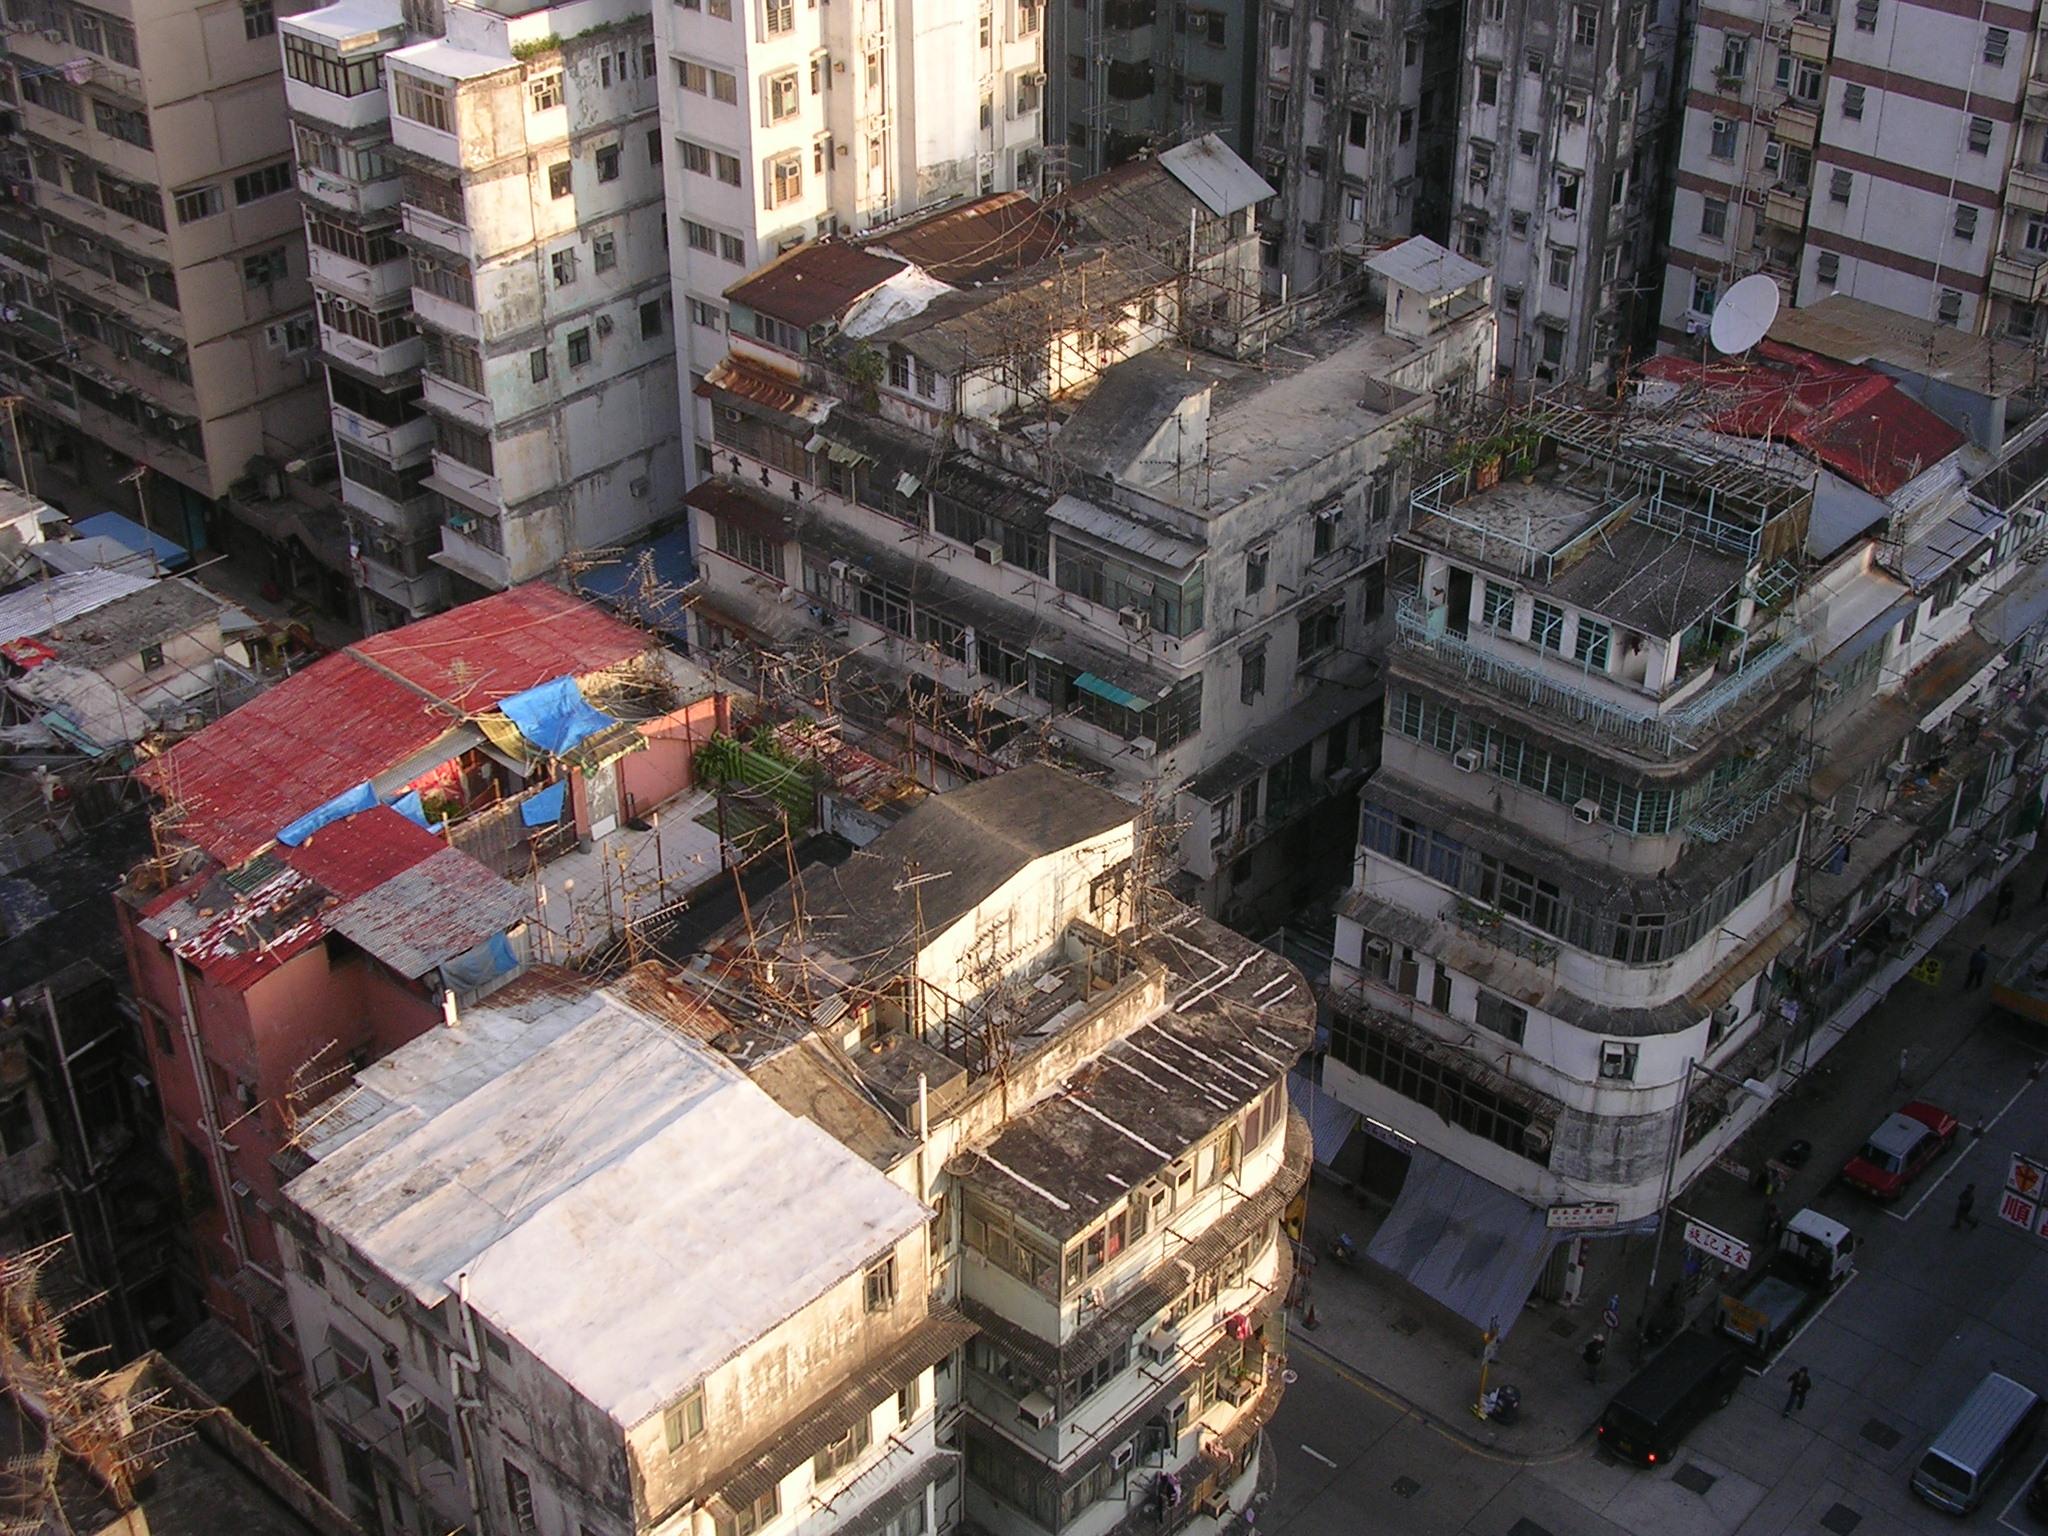 Sham_Shui_Po_rooftops.JPG